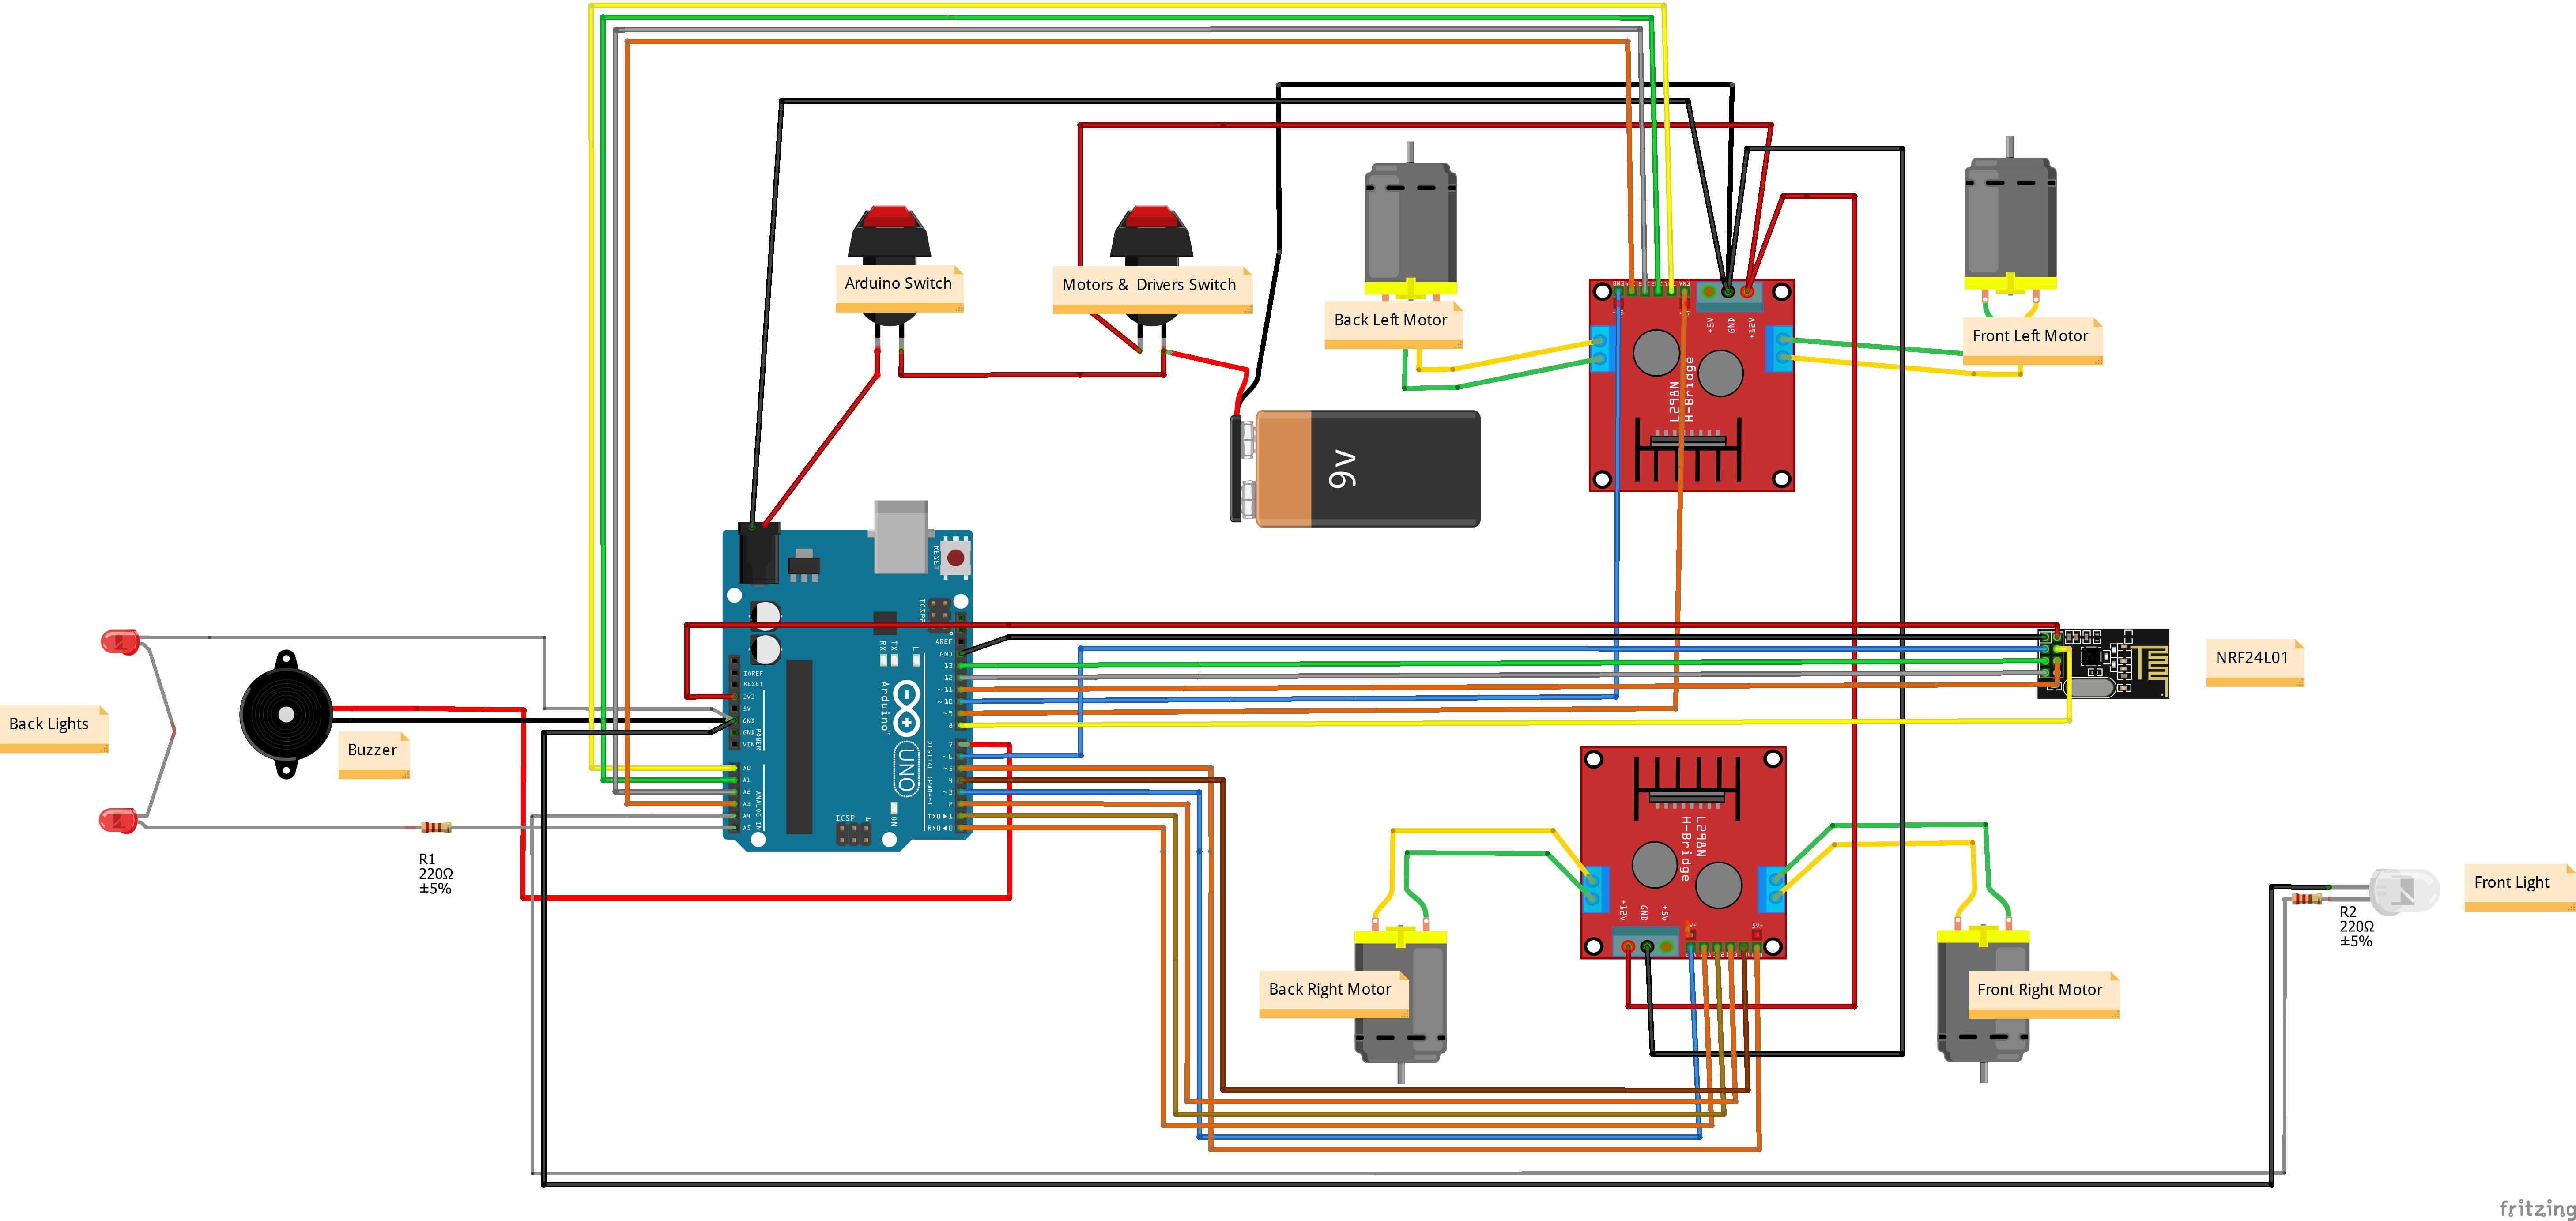 rc car wiring diagram wiring diagram forward wired remote control car circuit diagram rc car gas [ 5835 x 2766 Pixel ]